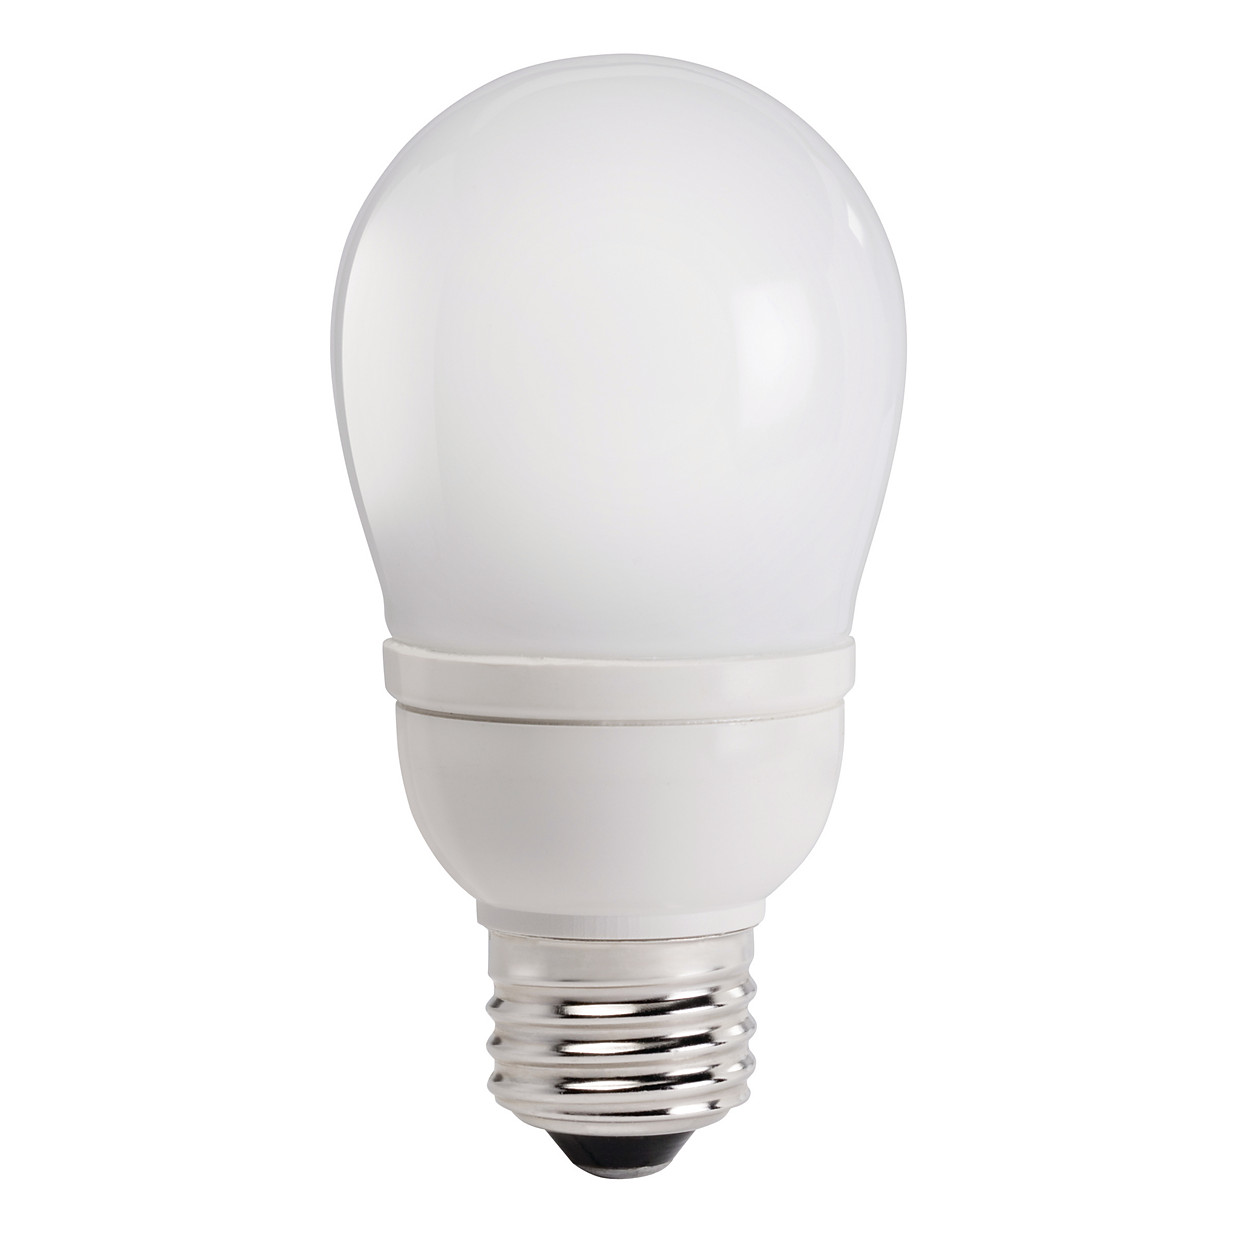 Buy The Philips Energysaver Ceiling Fan 046677152901